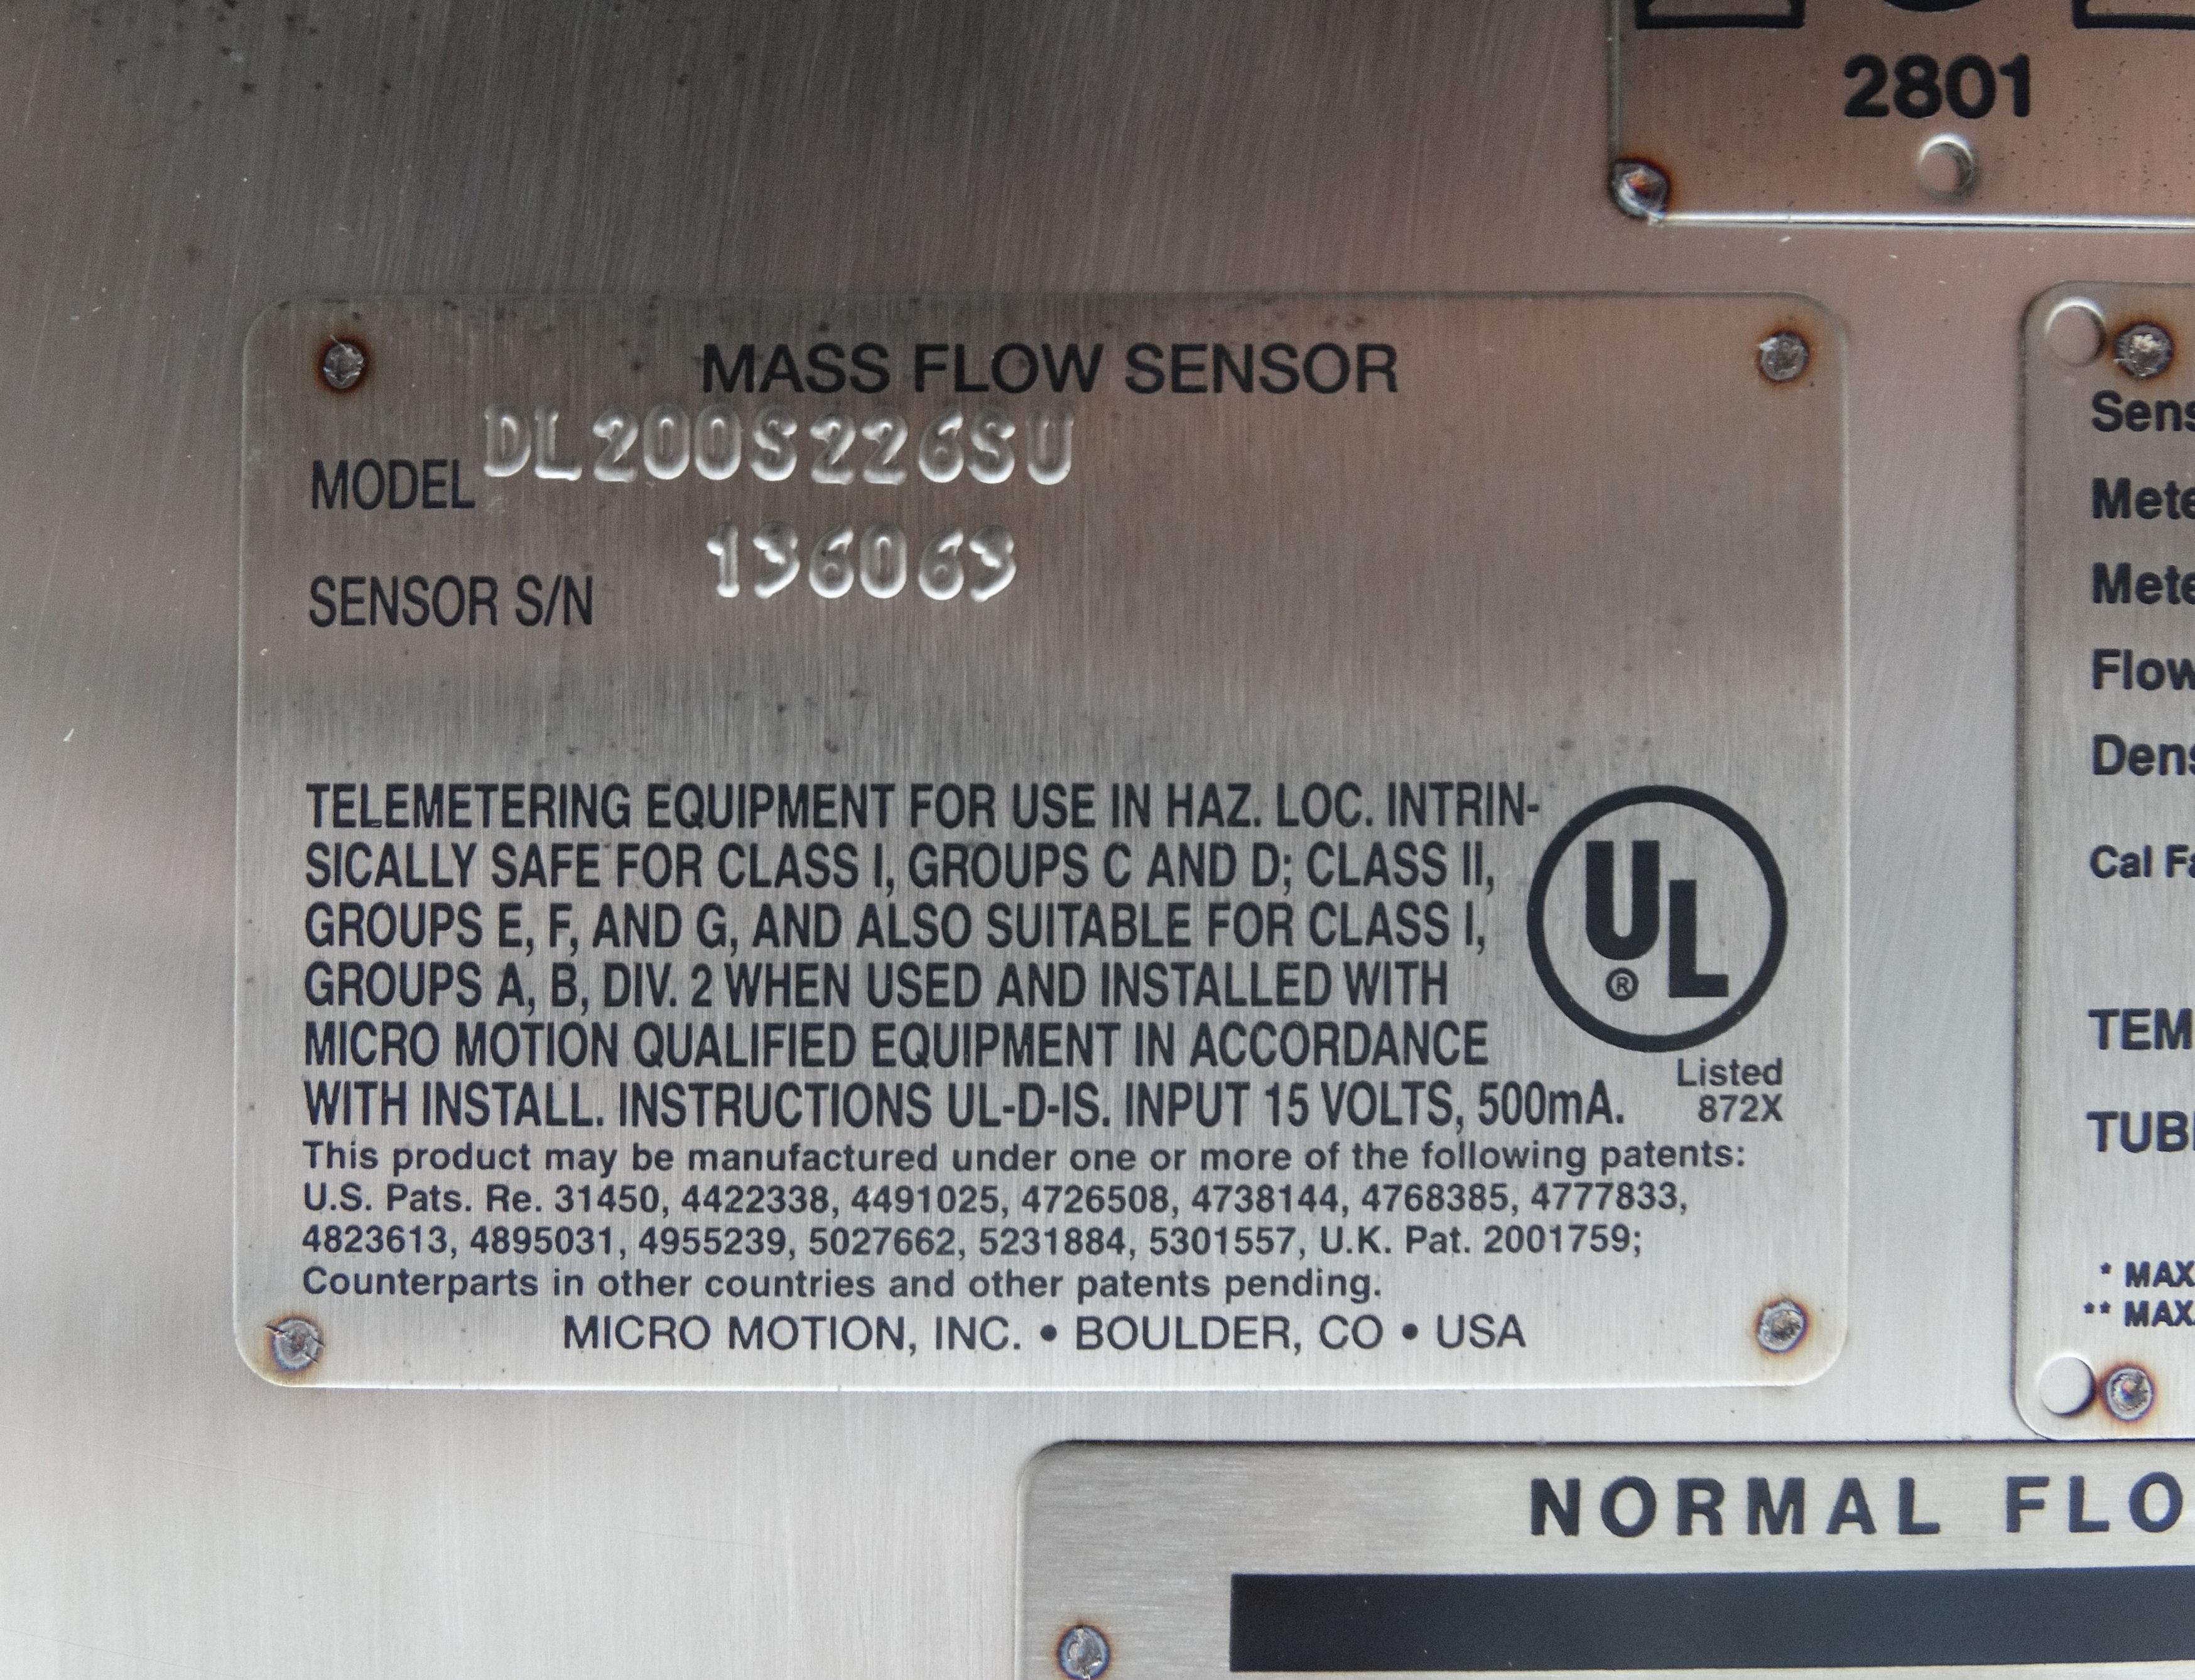 Micro Motion DL200S226SU Mass Flow Sensor D1533 - Image 5 of 5